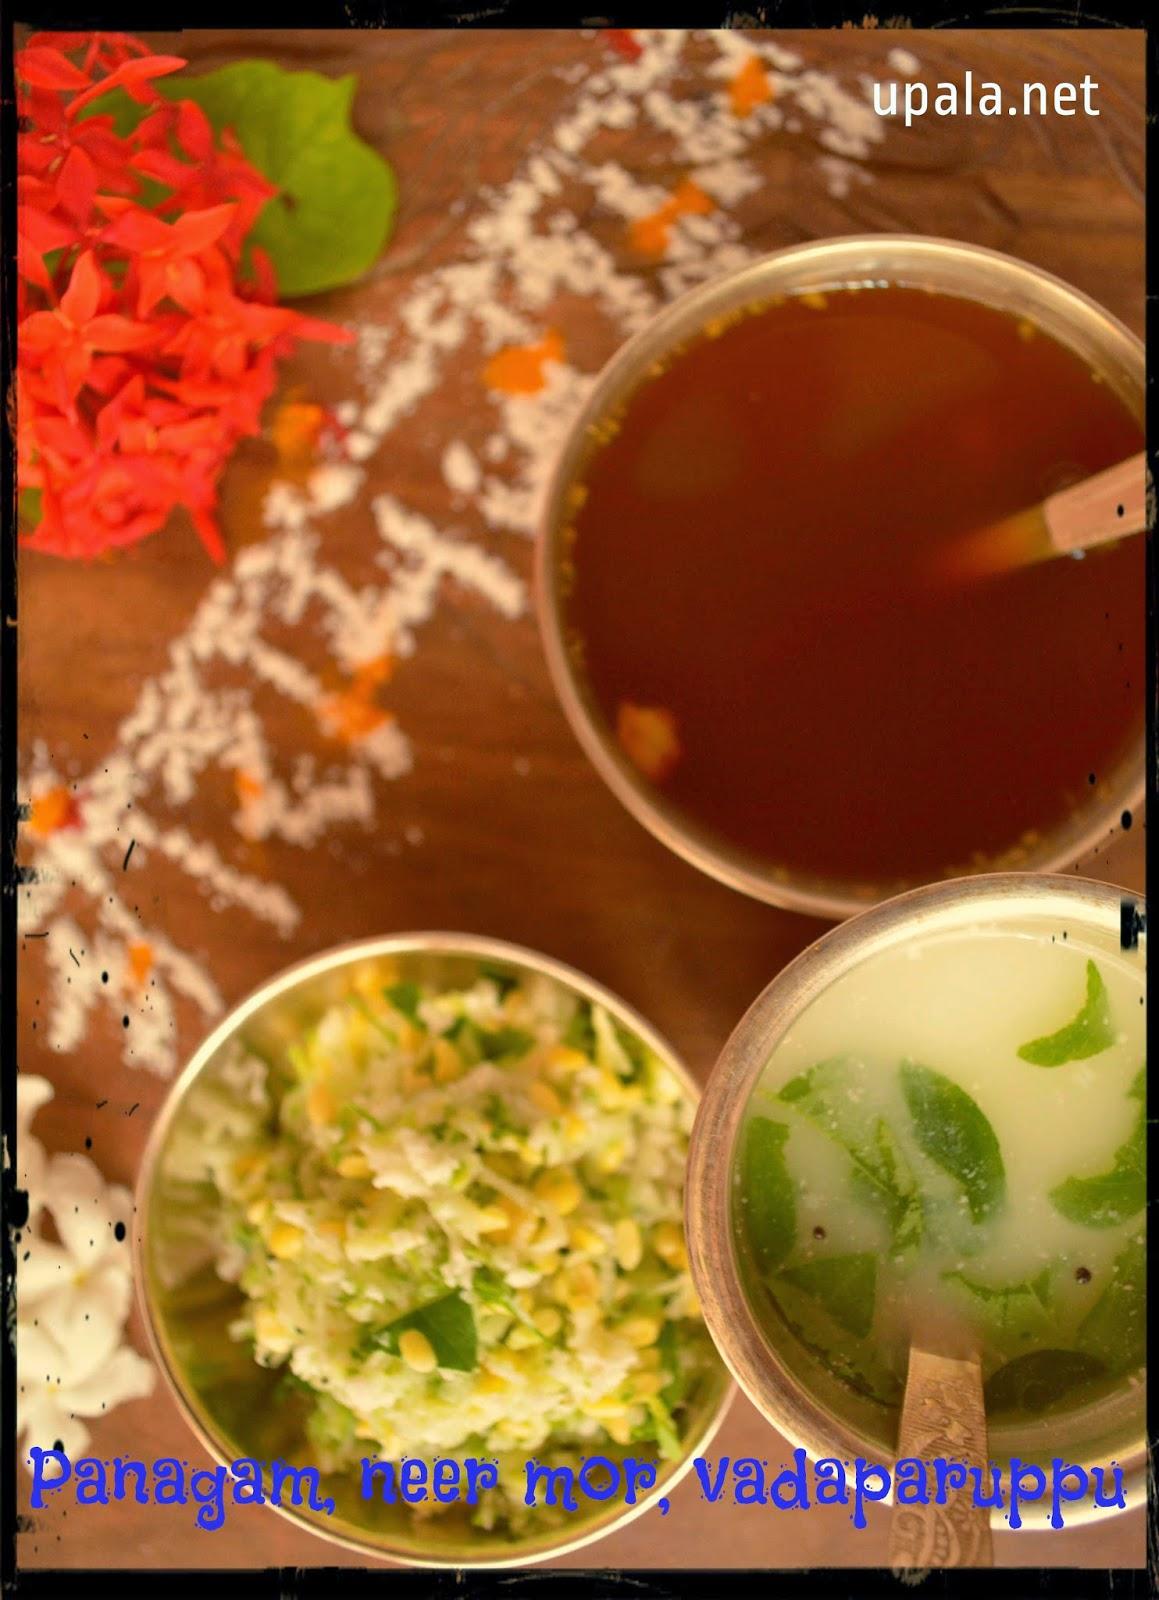 Sri Rama Navami Recipes-Panagam, Neer mor and Vadaparuppu